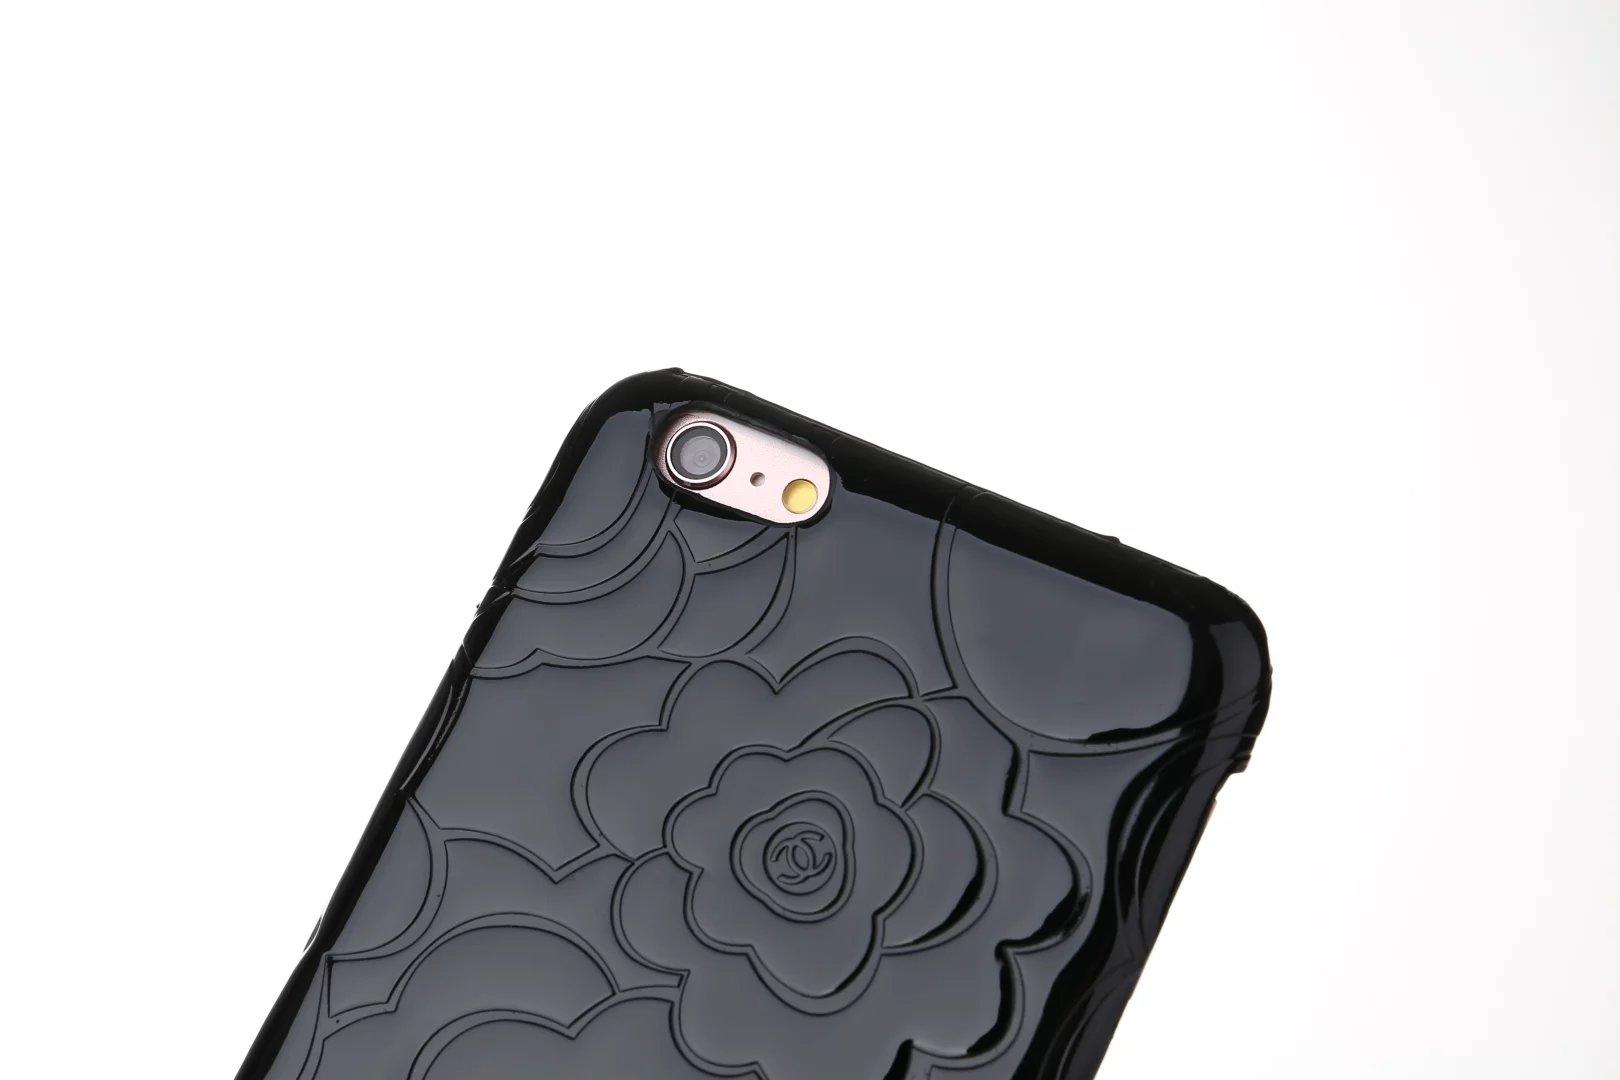 6 Plus iphone case best iphone 6 Plus case brands fashion iphone6 plus case designer iphone wallet cover for iphone design iphone 6 case iphone 6 mophie juice pack plus order phone cases customise your own iphone case